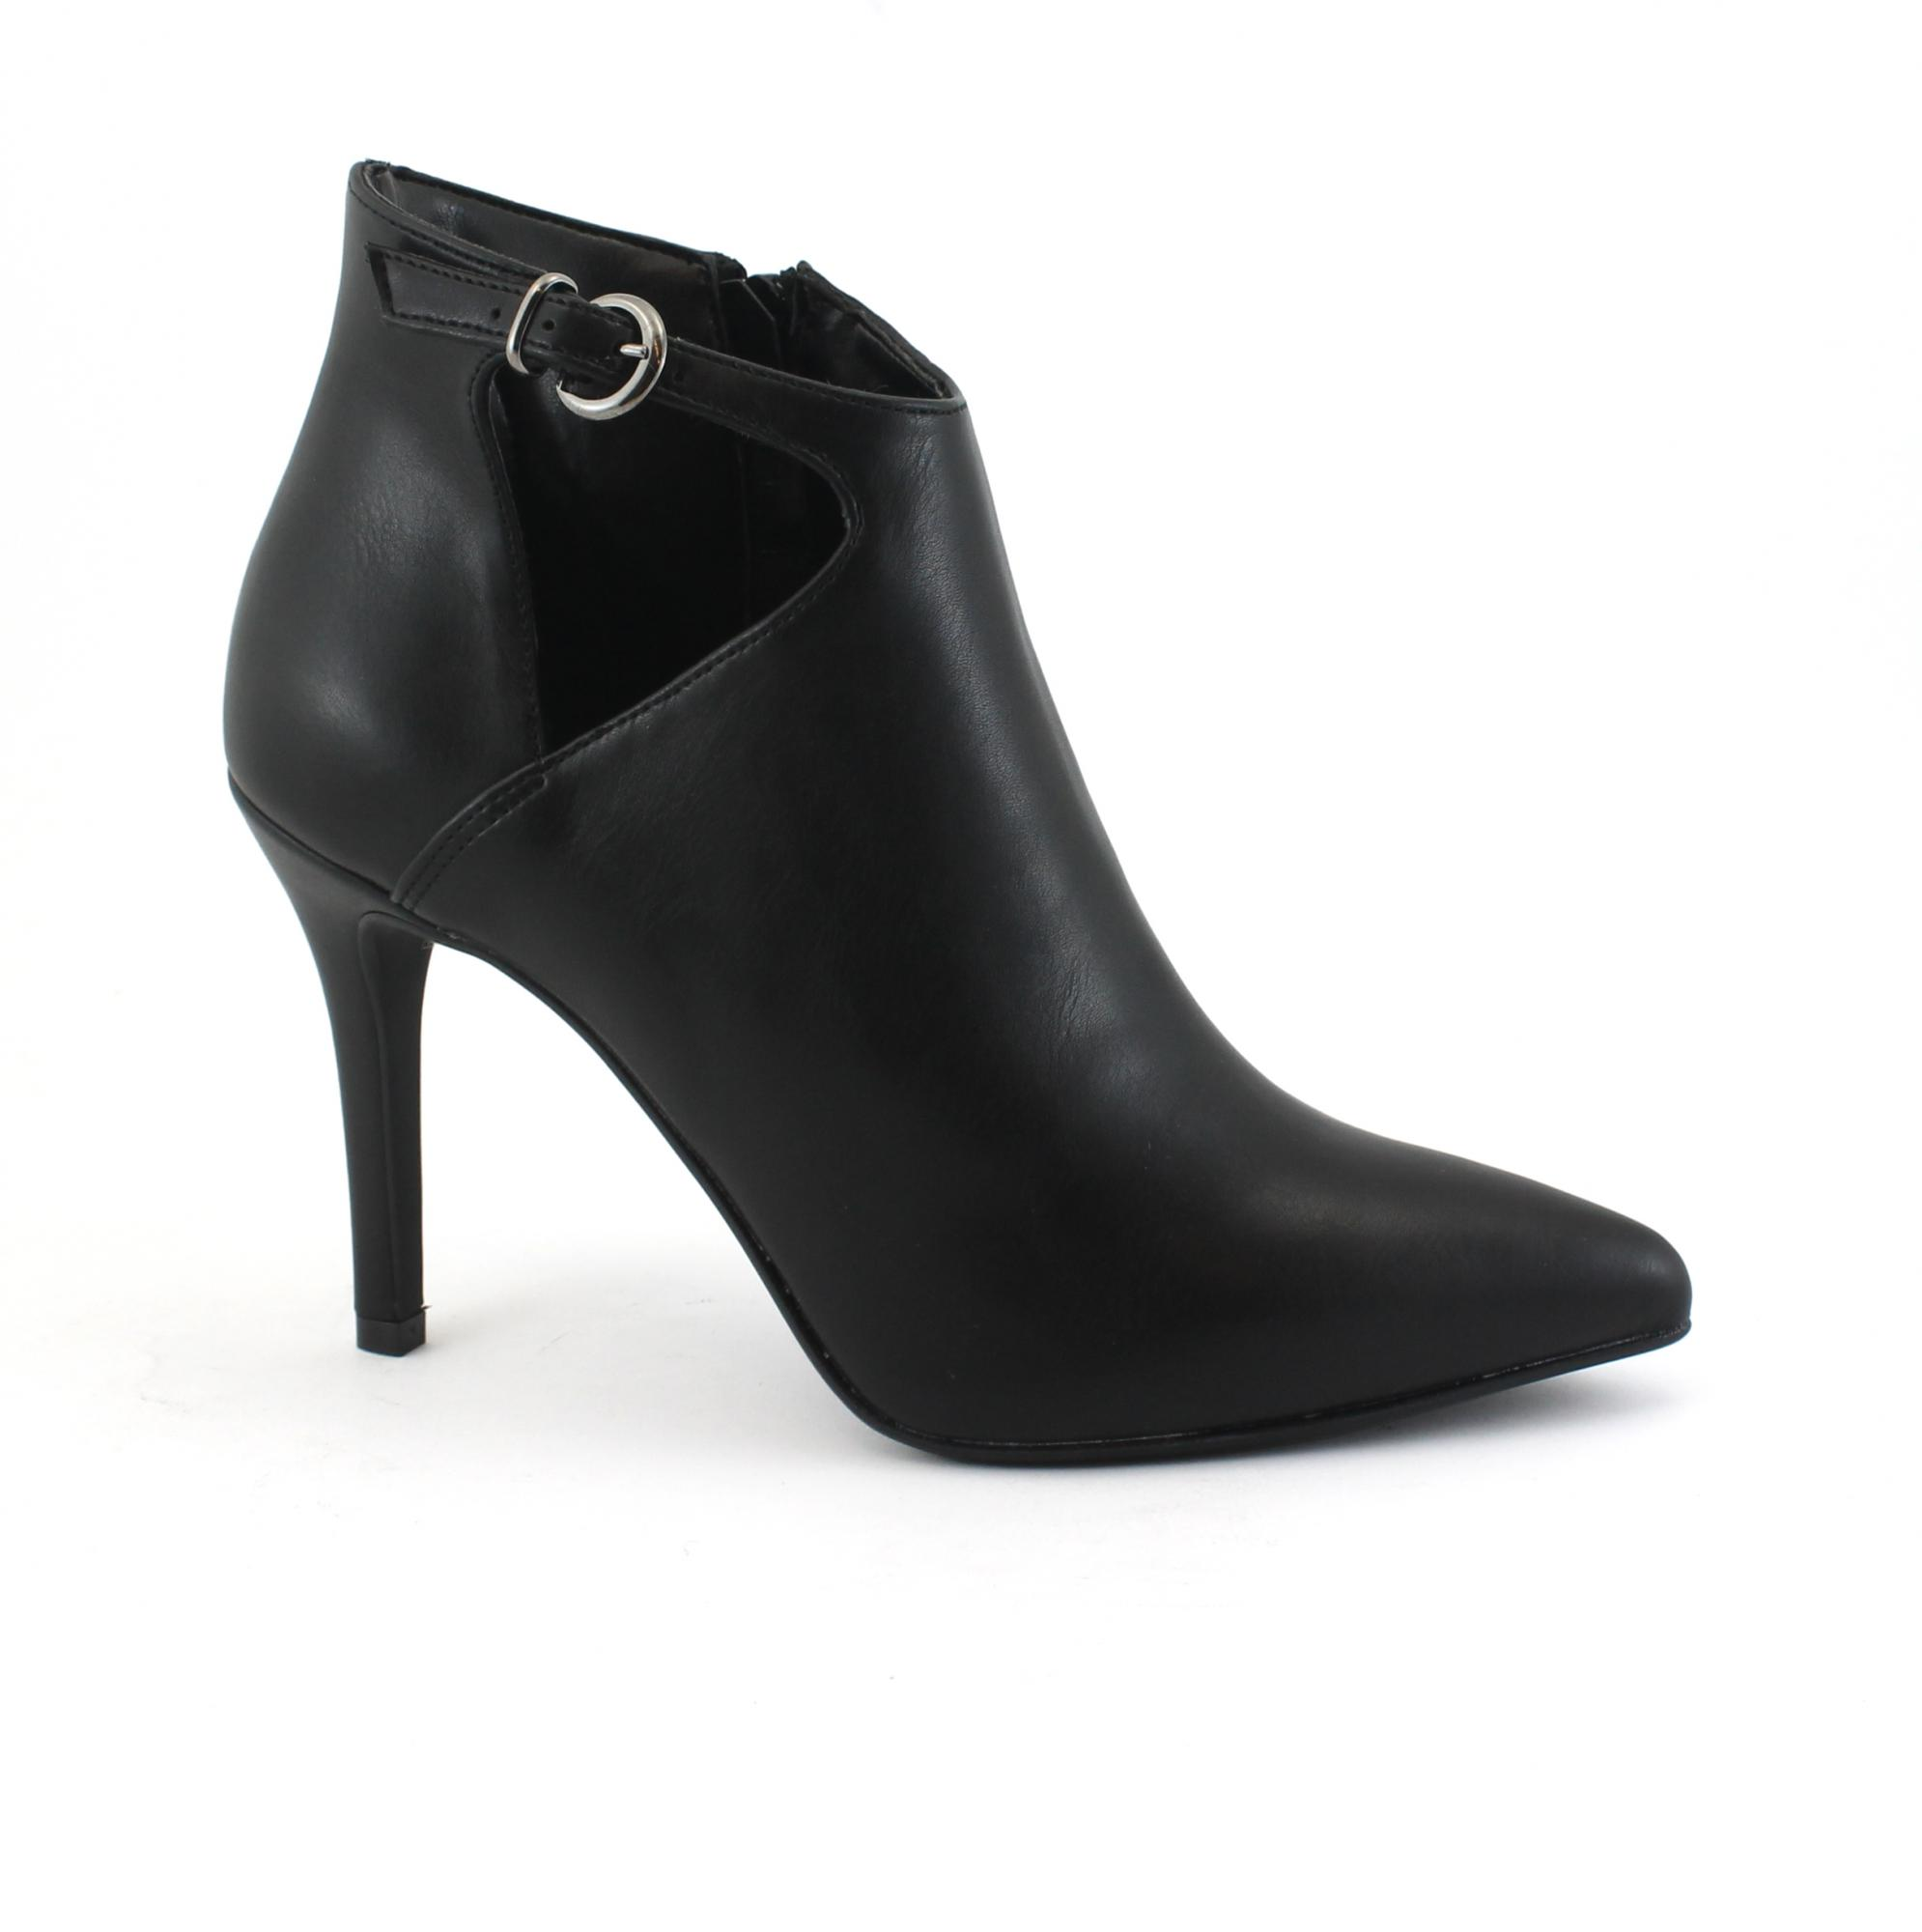 357b798a71c722 VSI Shoes Woman Tronchetti Zip Strap vegane Fersenschuhe Made in Italy -  VeganShoes.it